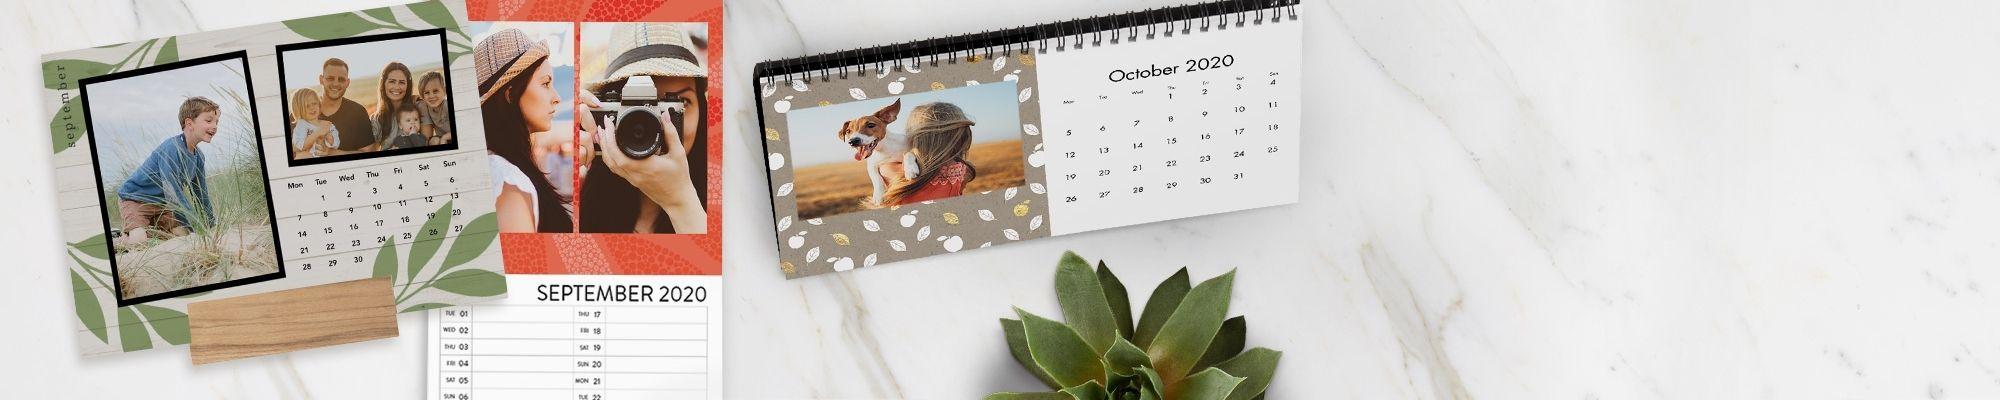 2021 Personalised Calendars